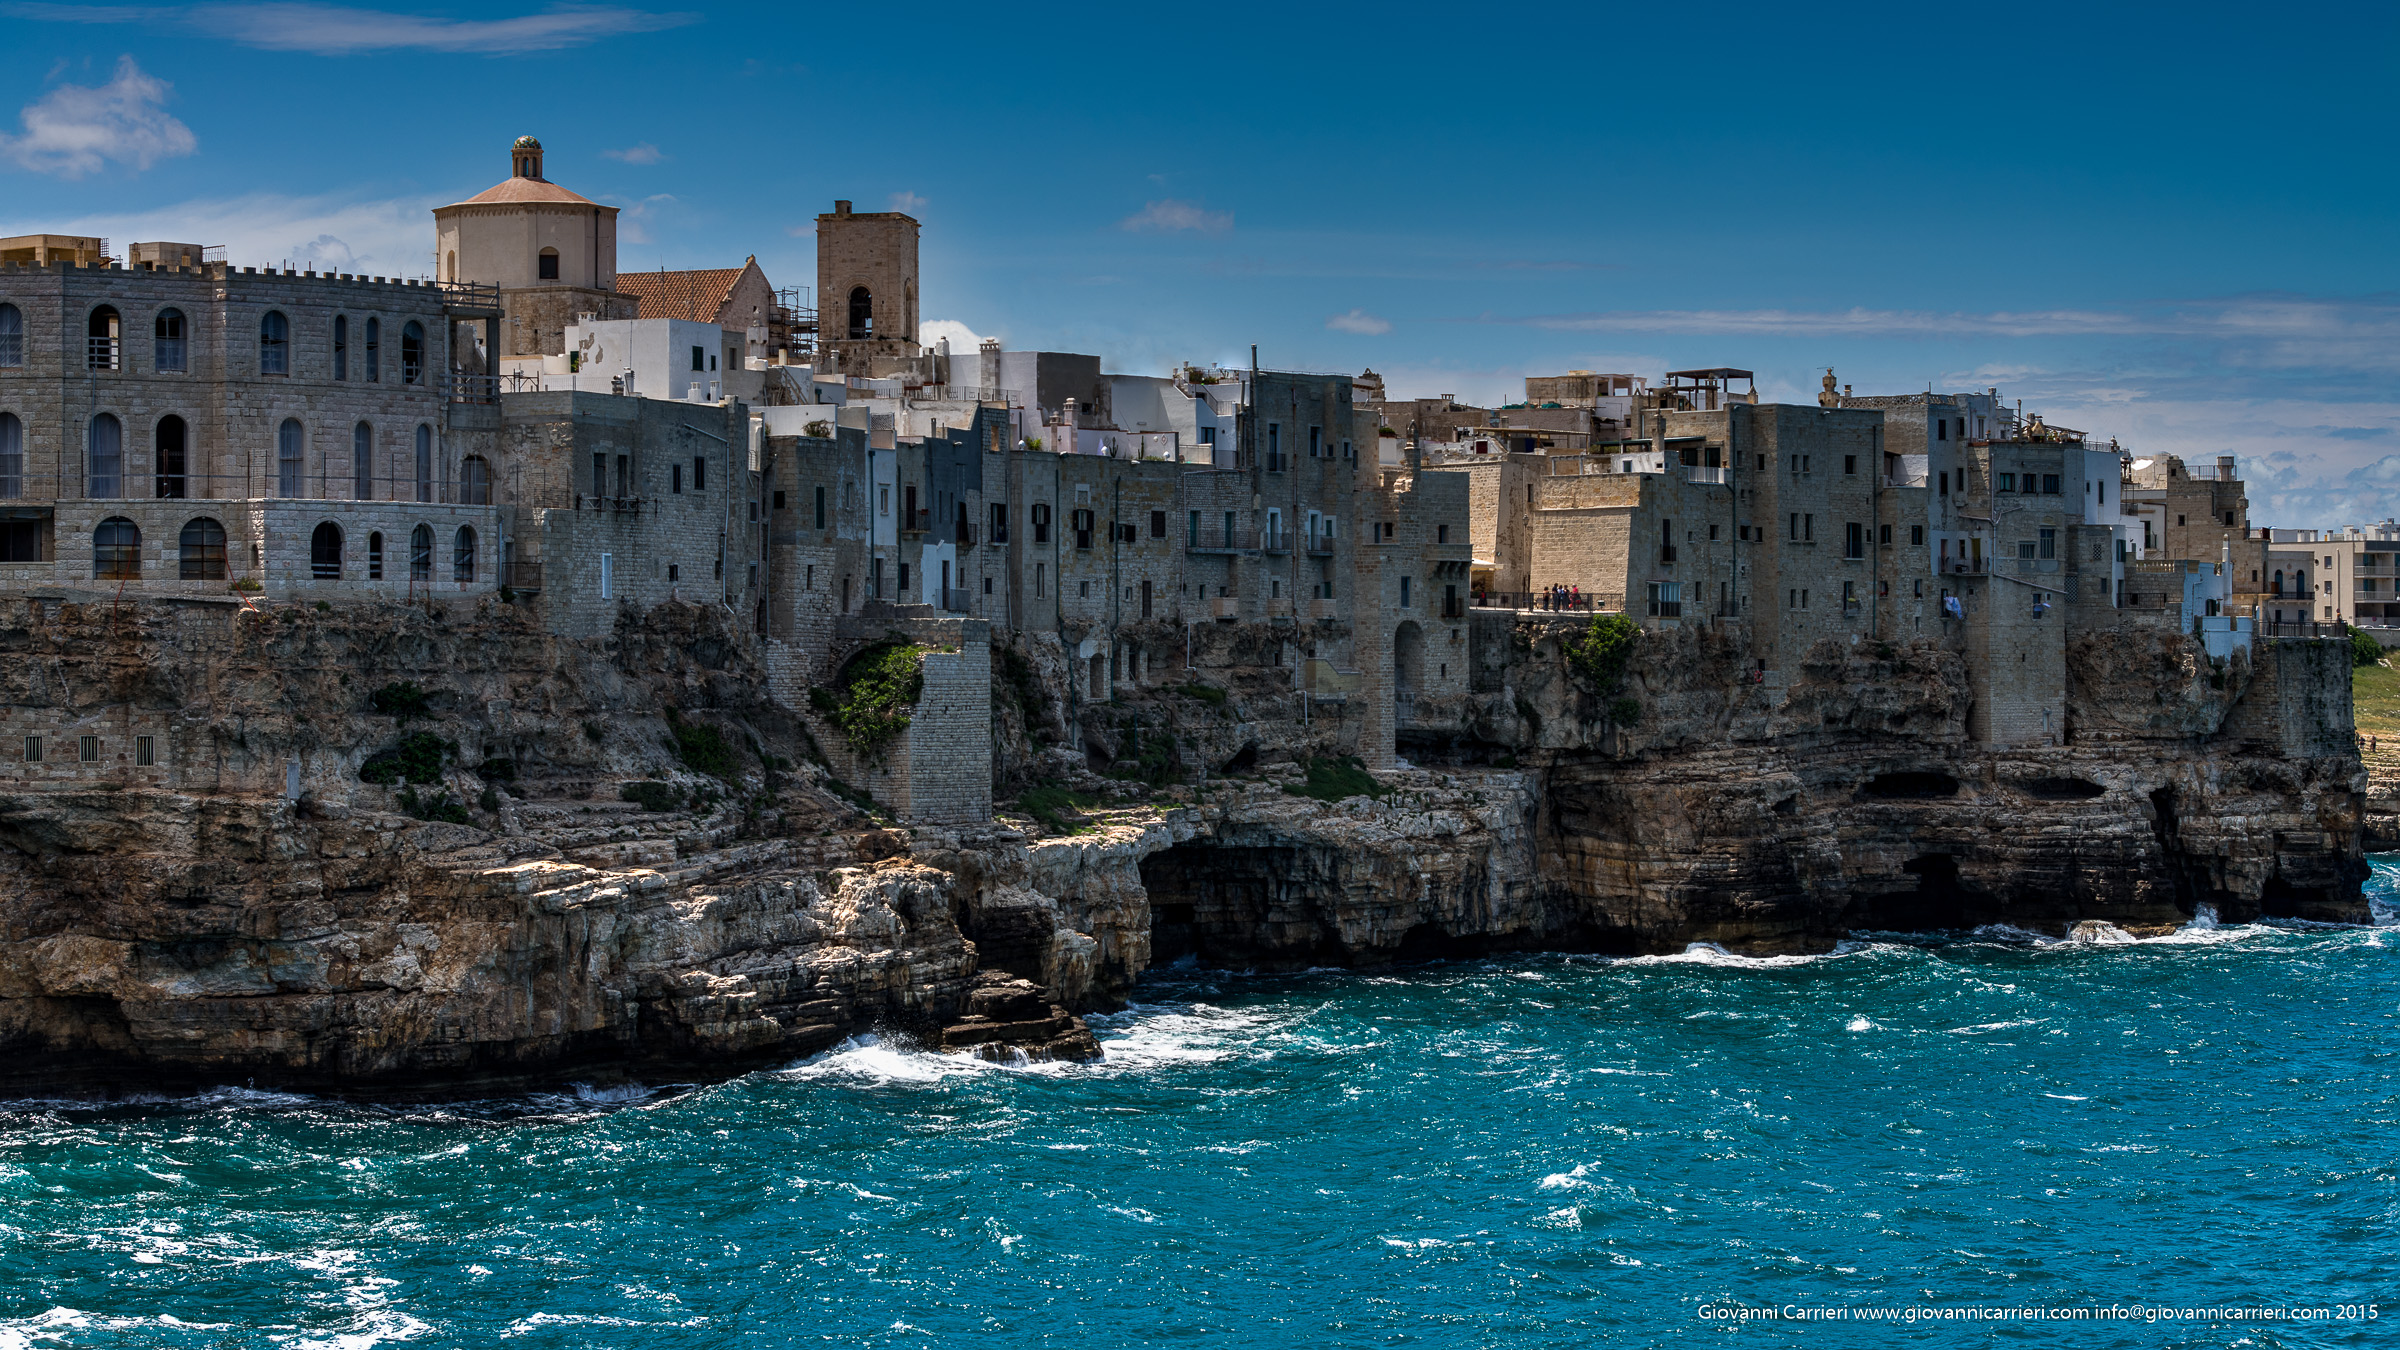 Polignano old city